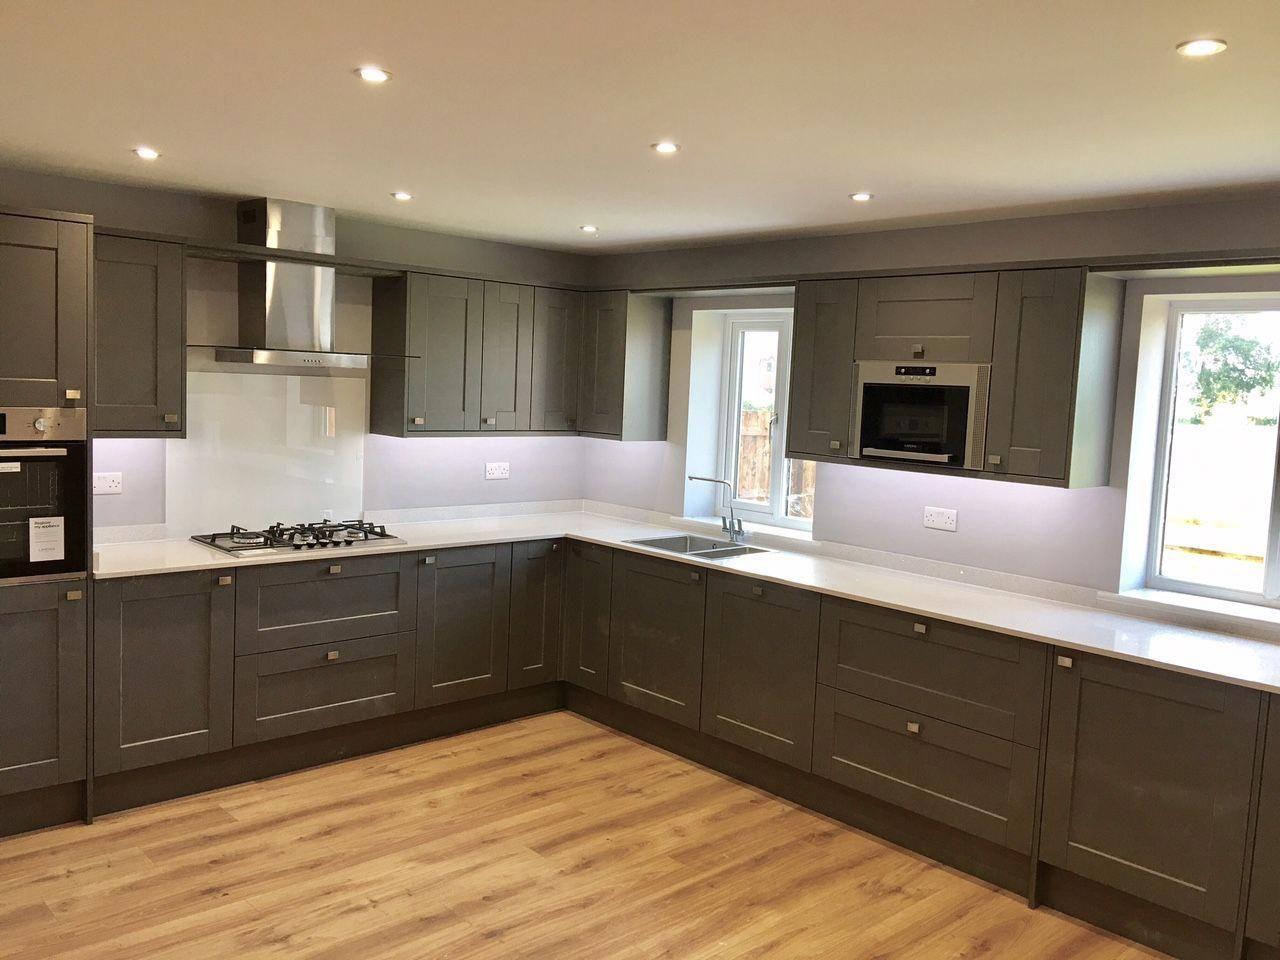 This Fairford Kitchen in Slate Grey with Quartz Worktops